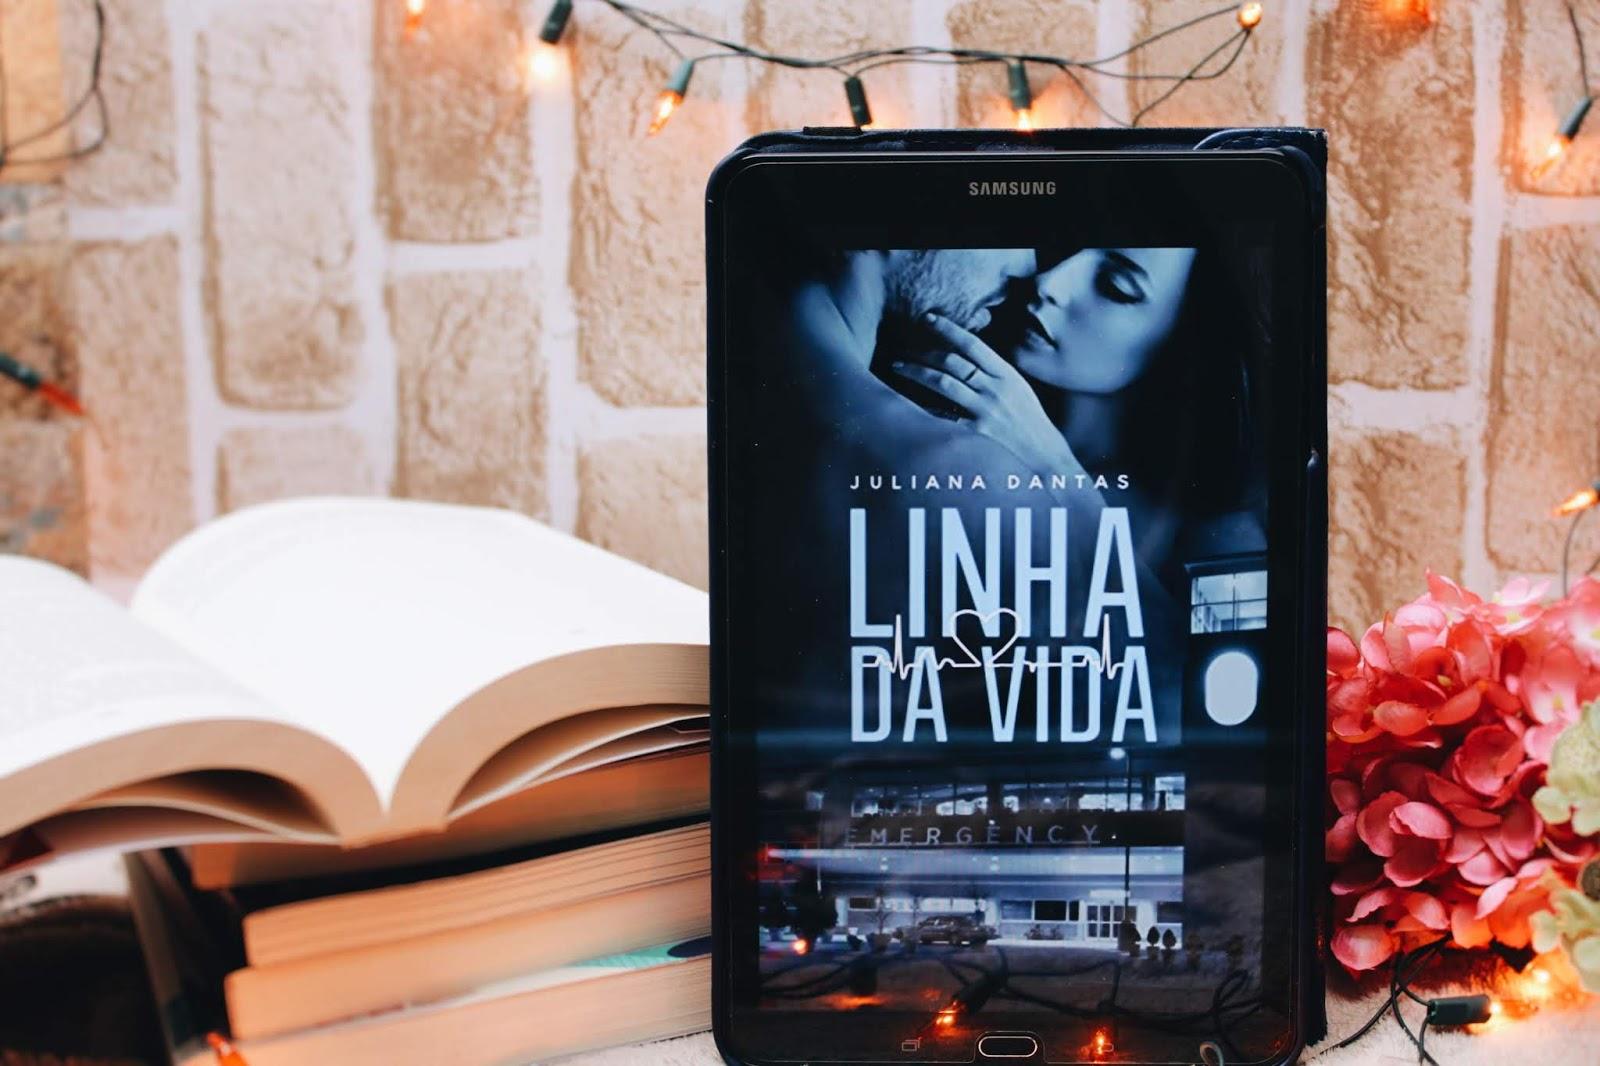 Linha da vida - Juliana Dantas | Resenha